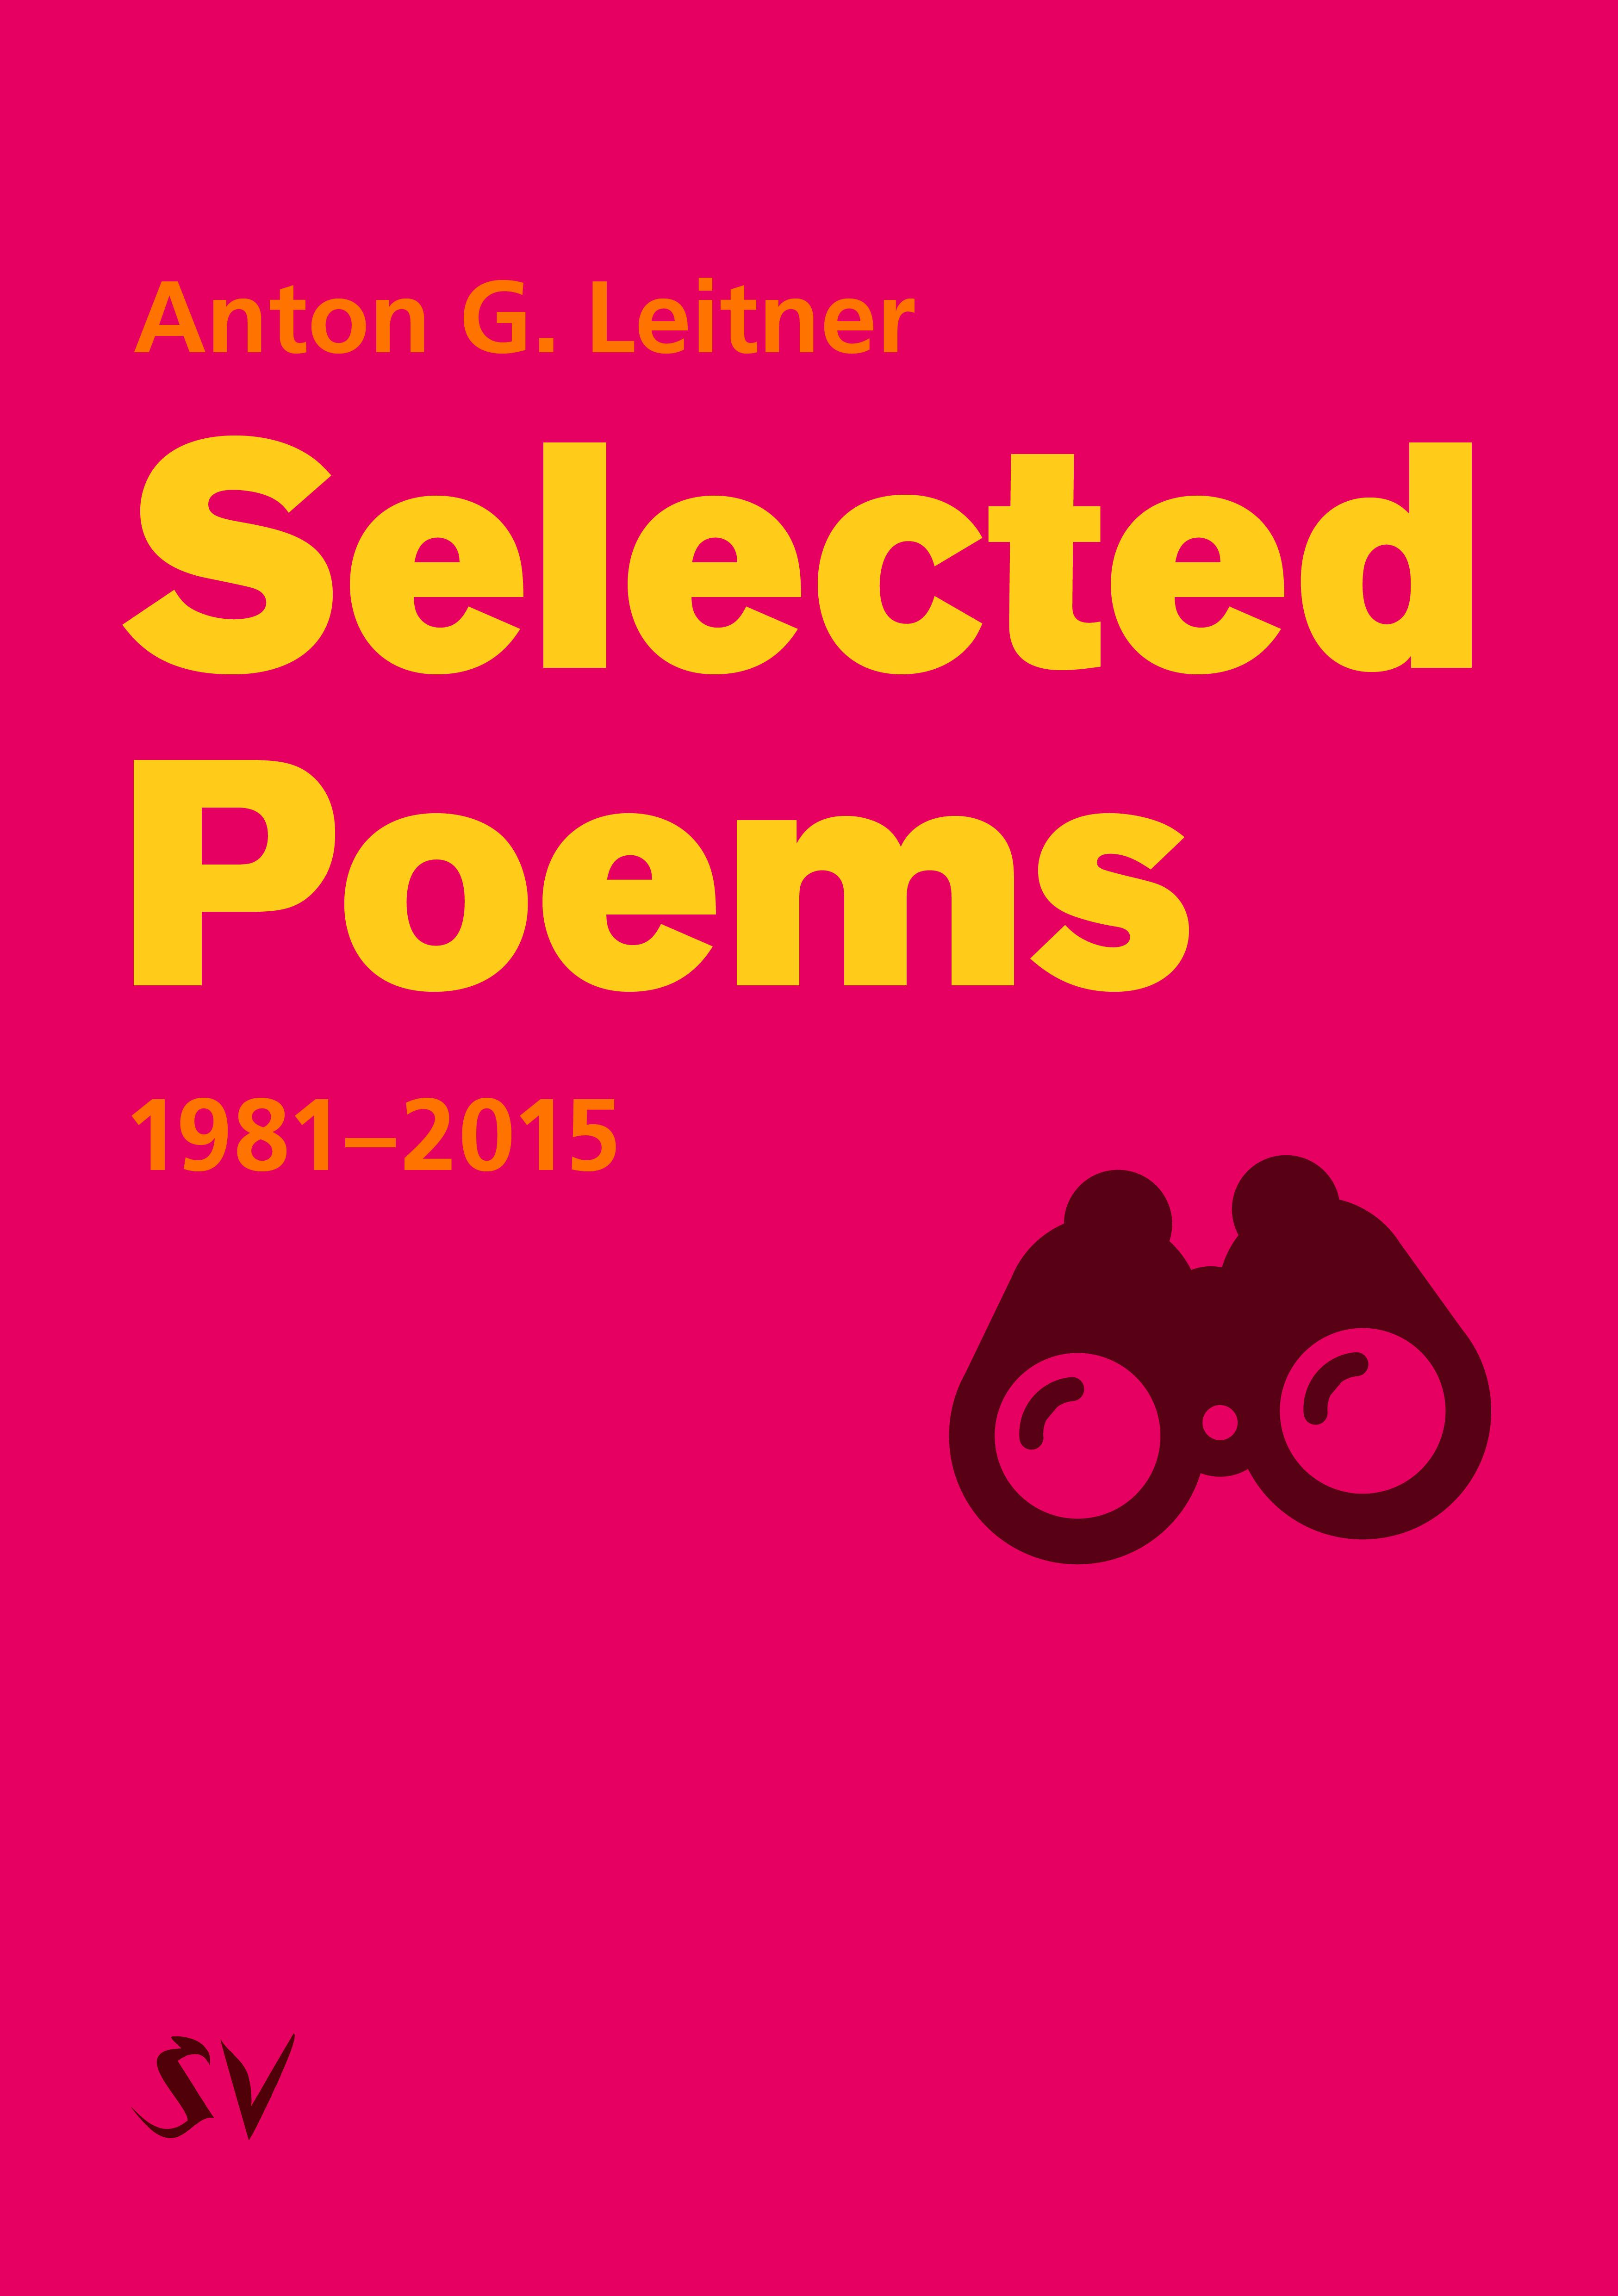 Anton G. Leitner: Selected Poems